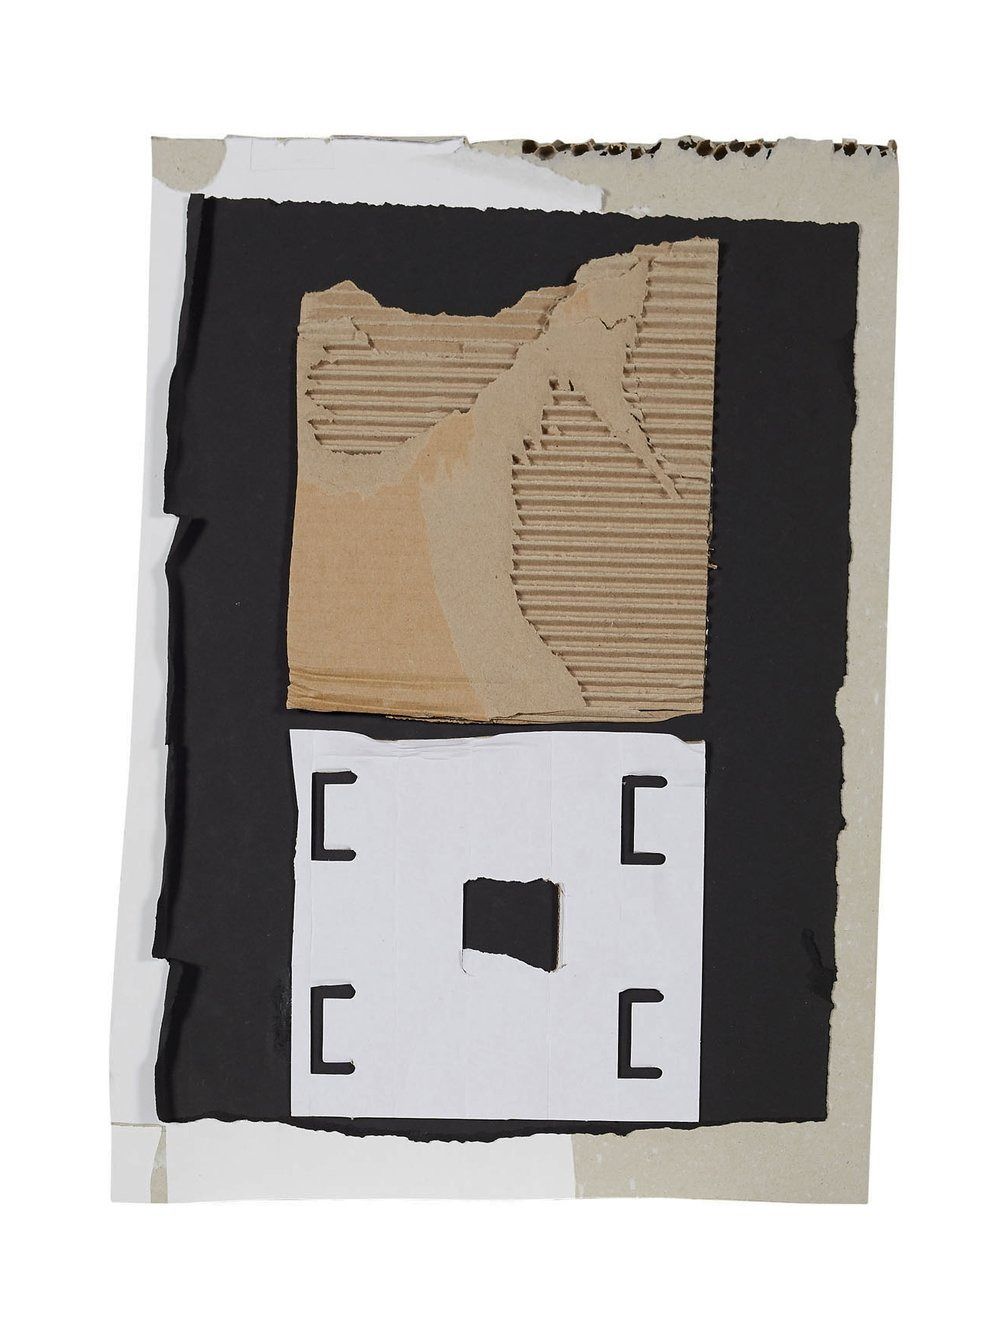 Untitled #2  Cardboard, matte black paper and archival glue.  Framed 56 x 66 x 6 cm